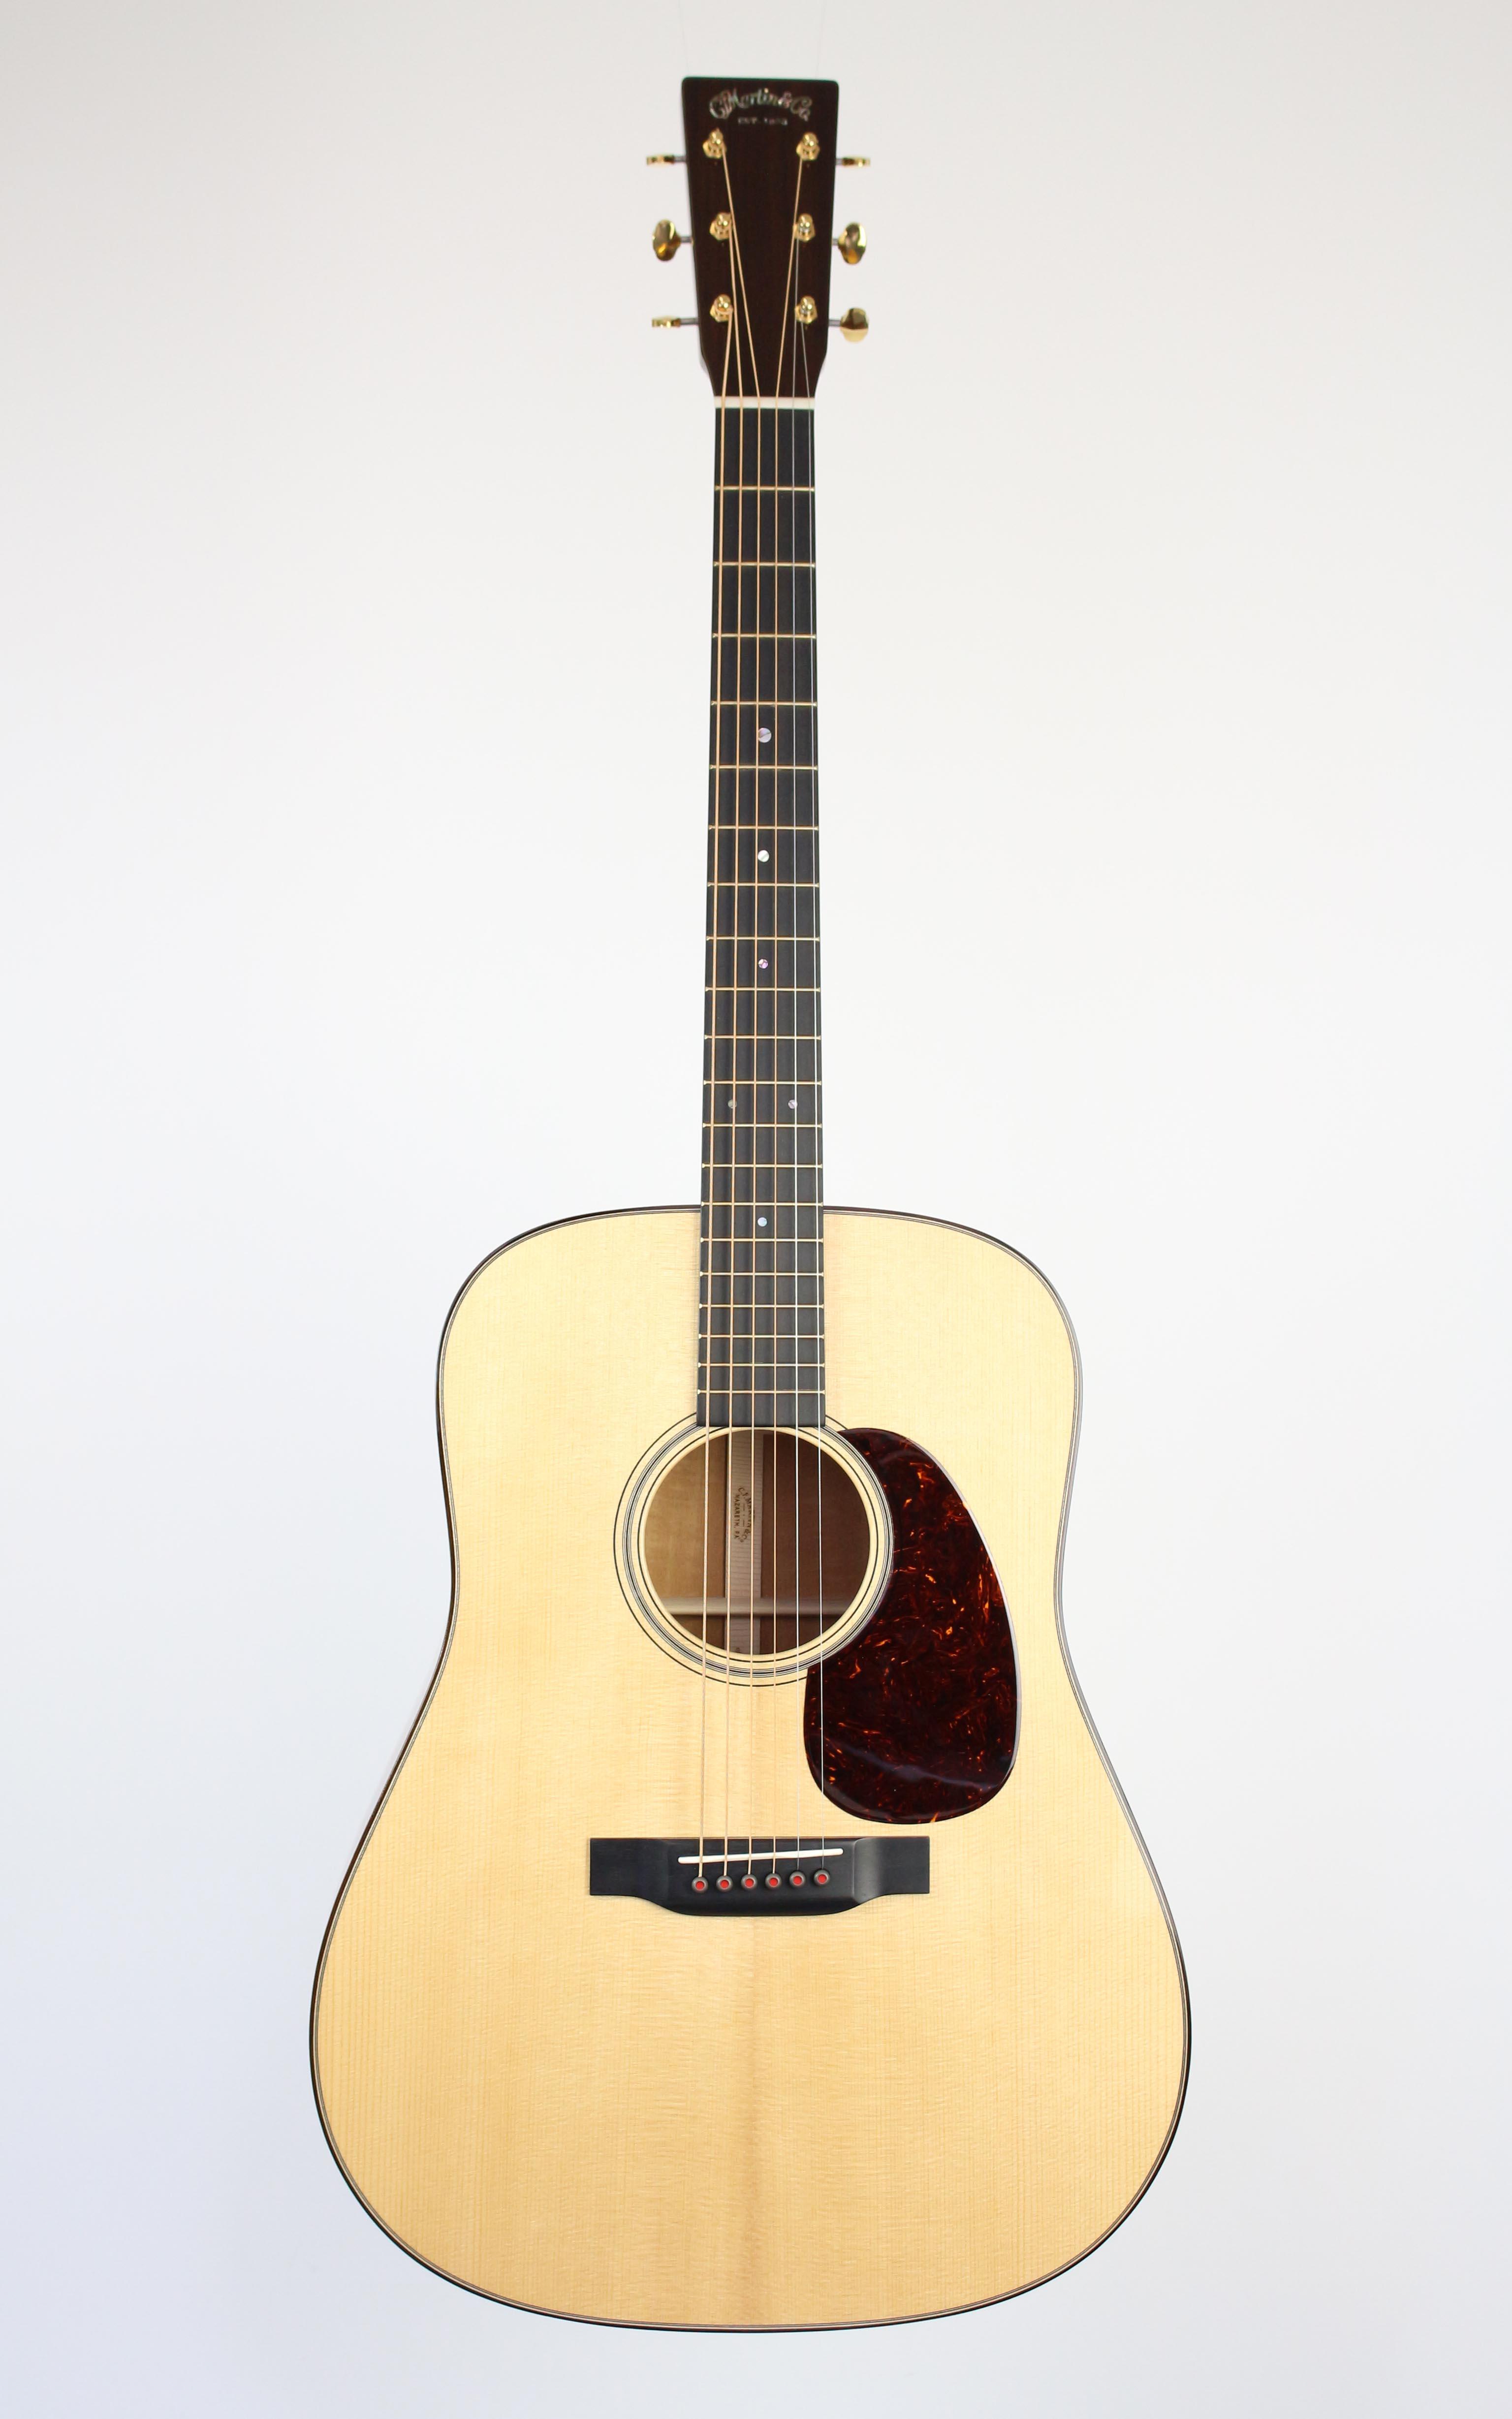 Martin - D - 18 Modern Deluxe - Gitarren - Westerngitarren | MUSIK BERTRAM Deutschland Freiburg